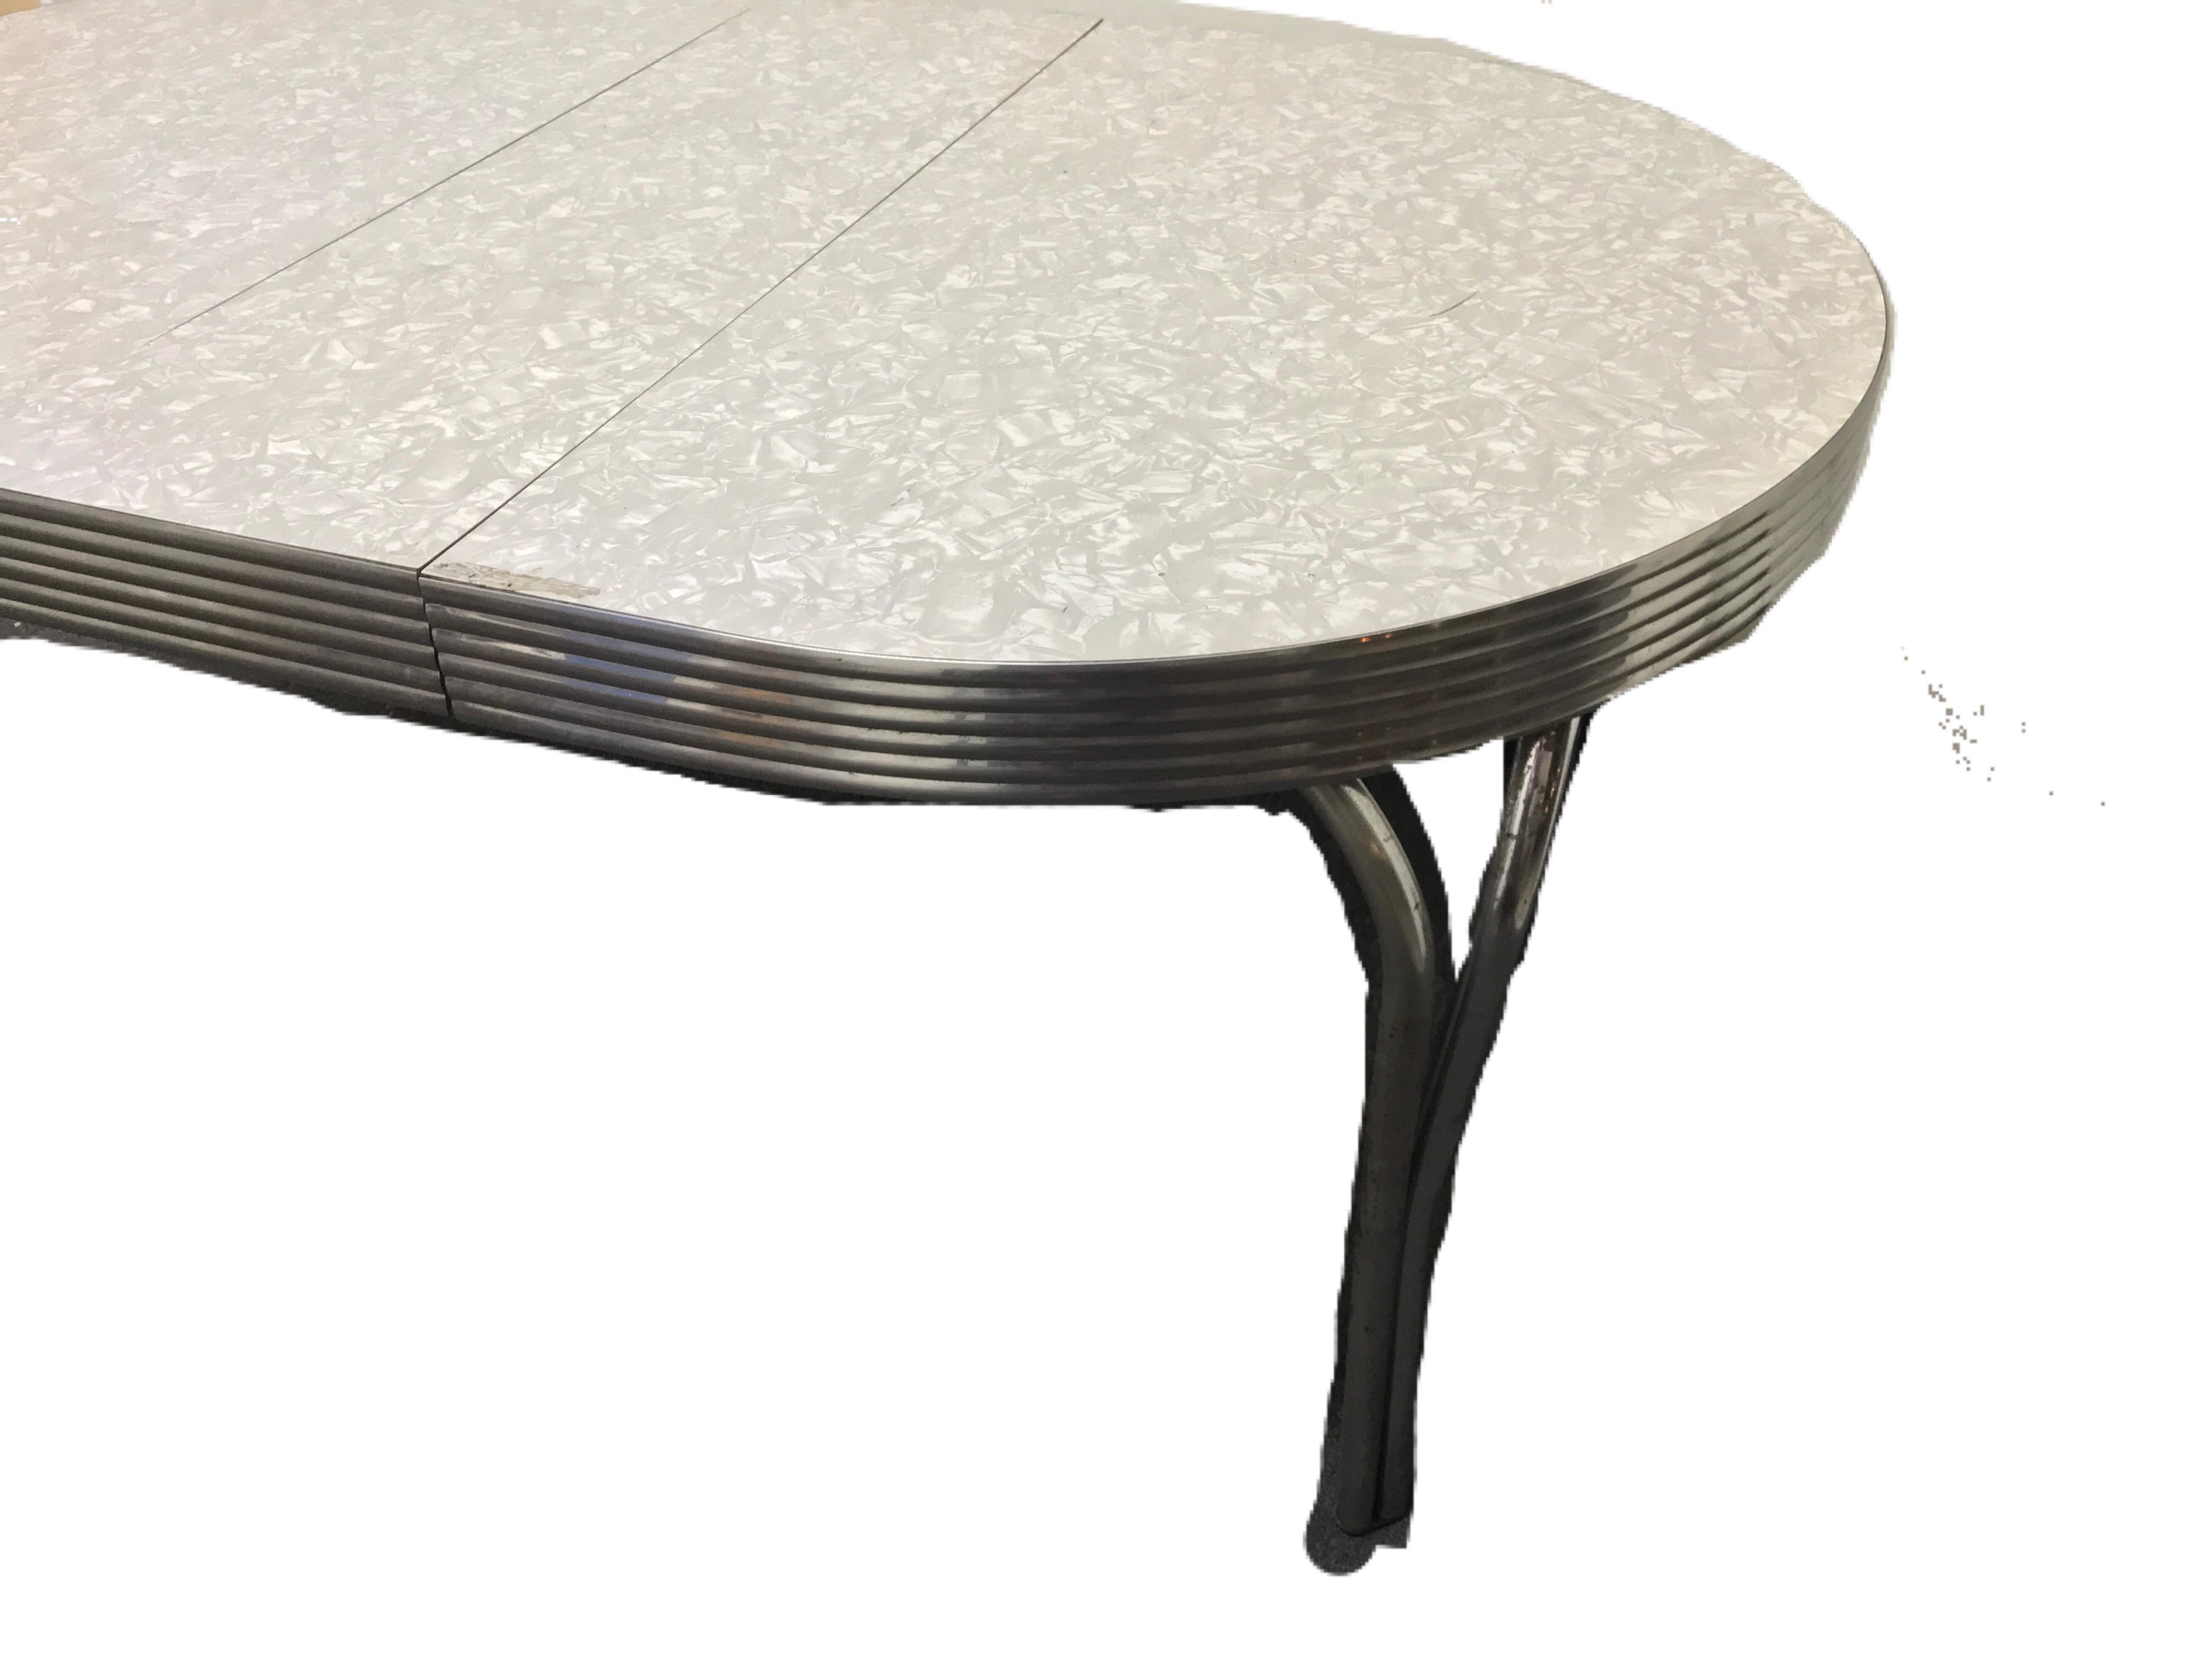 Vitro Vintage Cracked Ice Formica U0026 Chrome Dinette Table   Image 4 Of 10